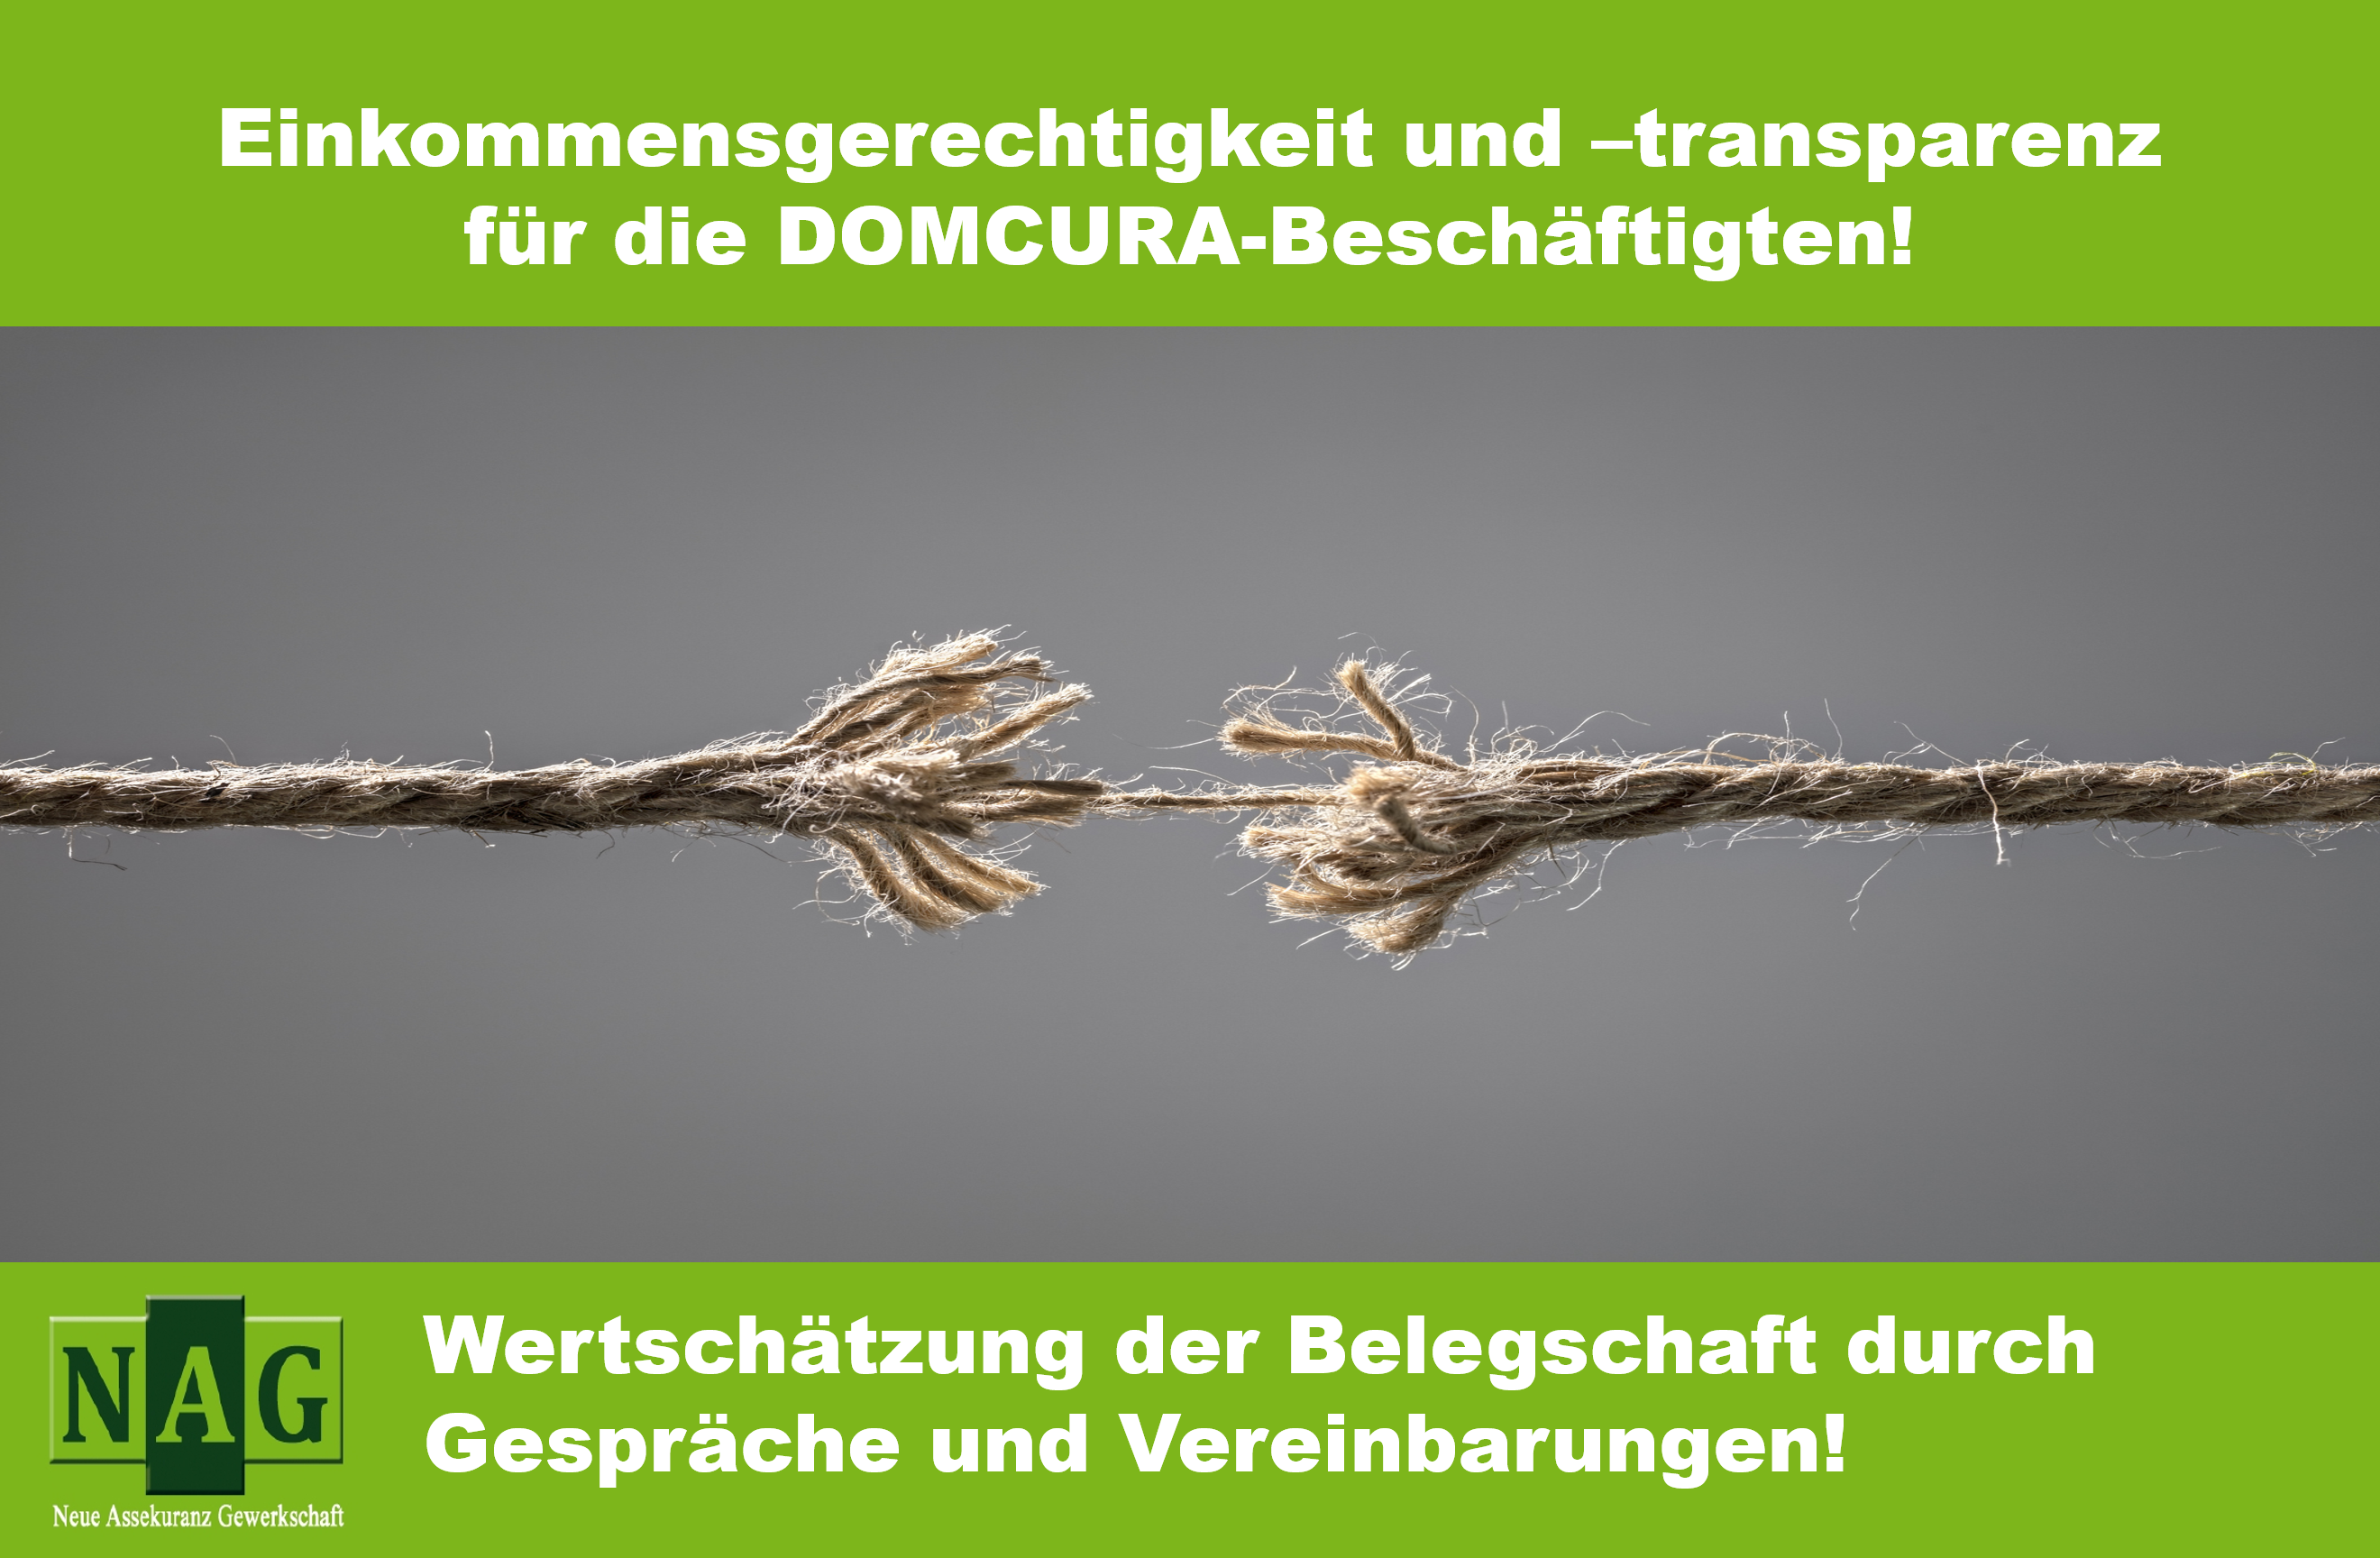 202104_Domcura_Petition